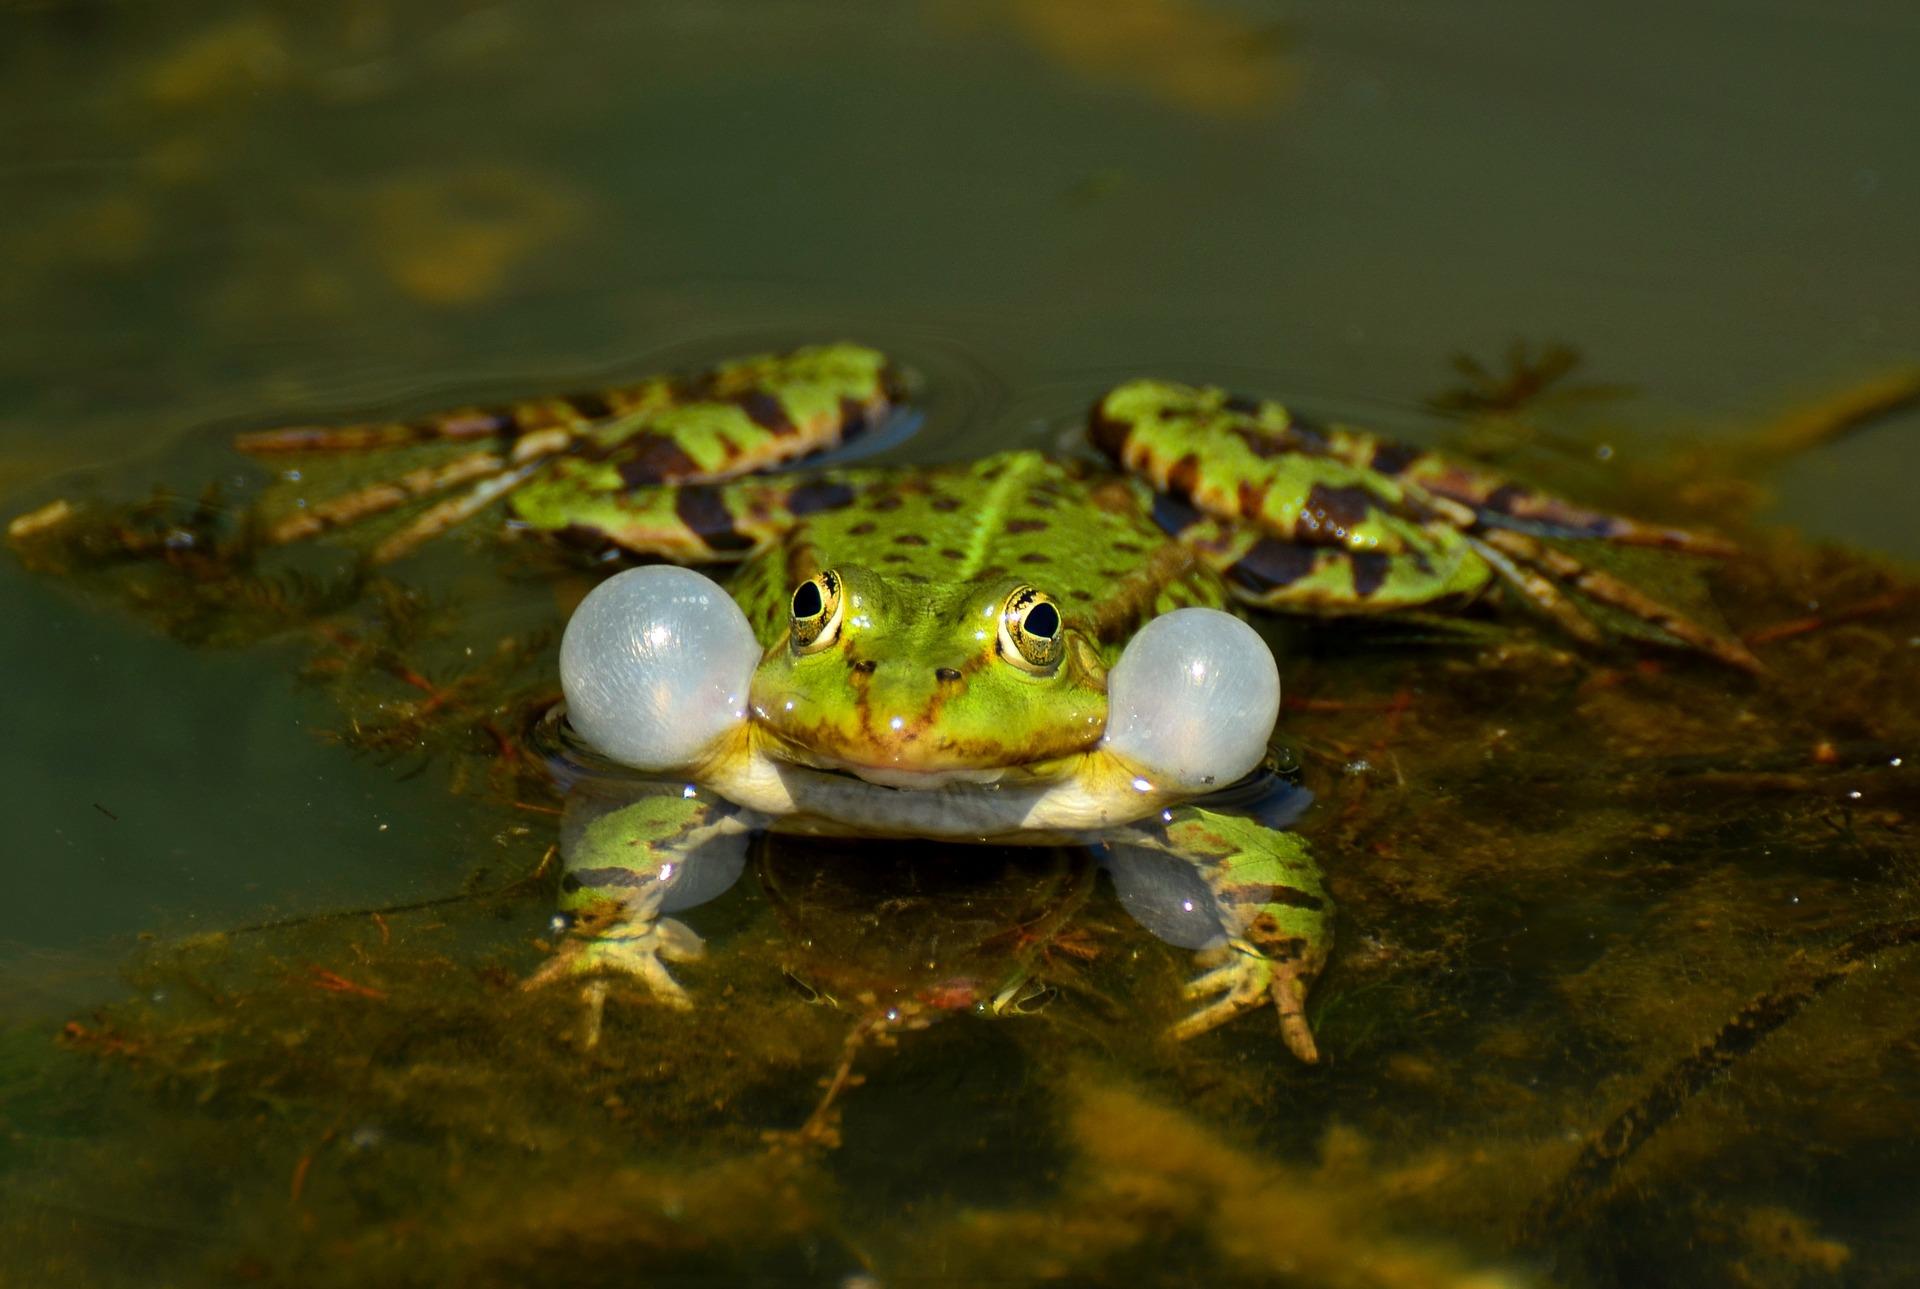 Froschquaken stört Nachtruhe, Herkunft Pixabay